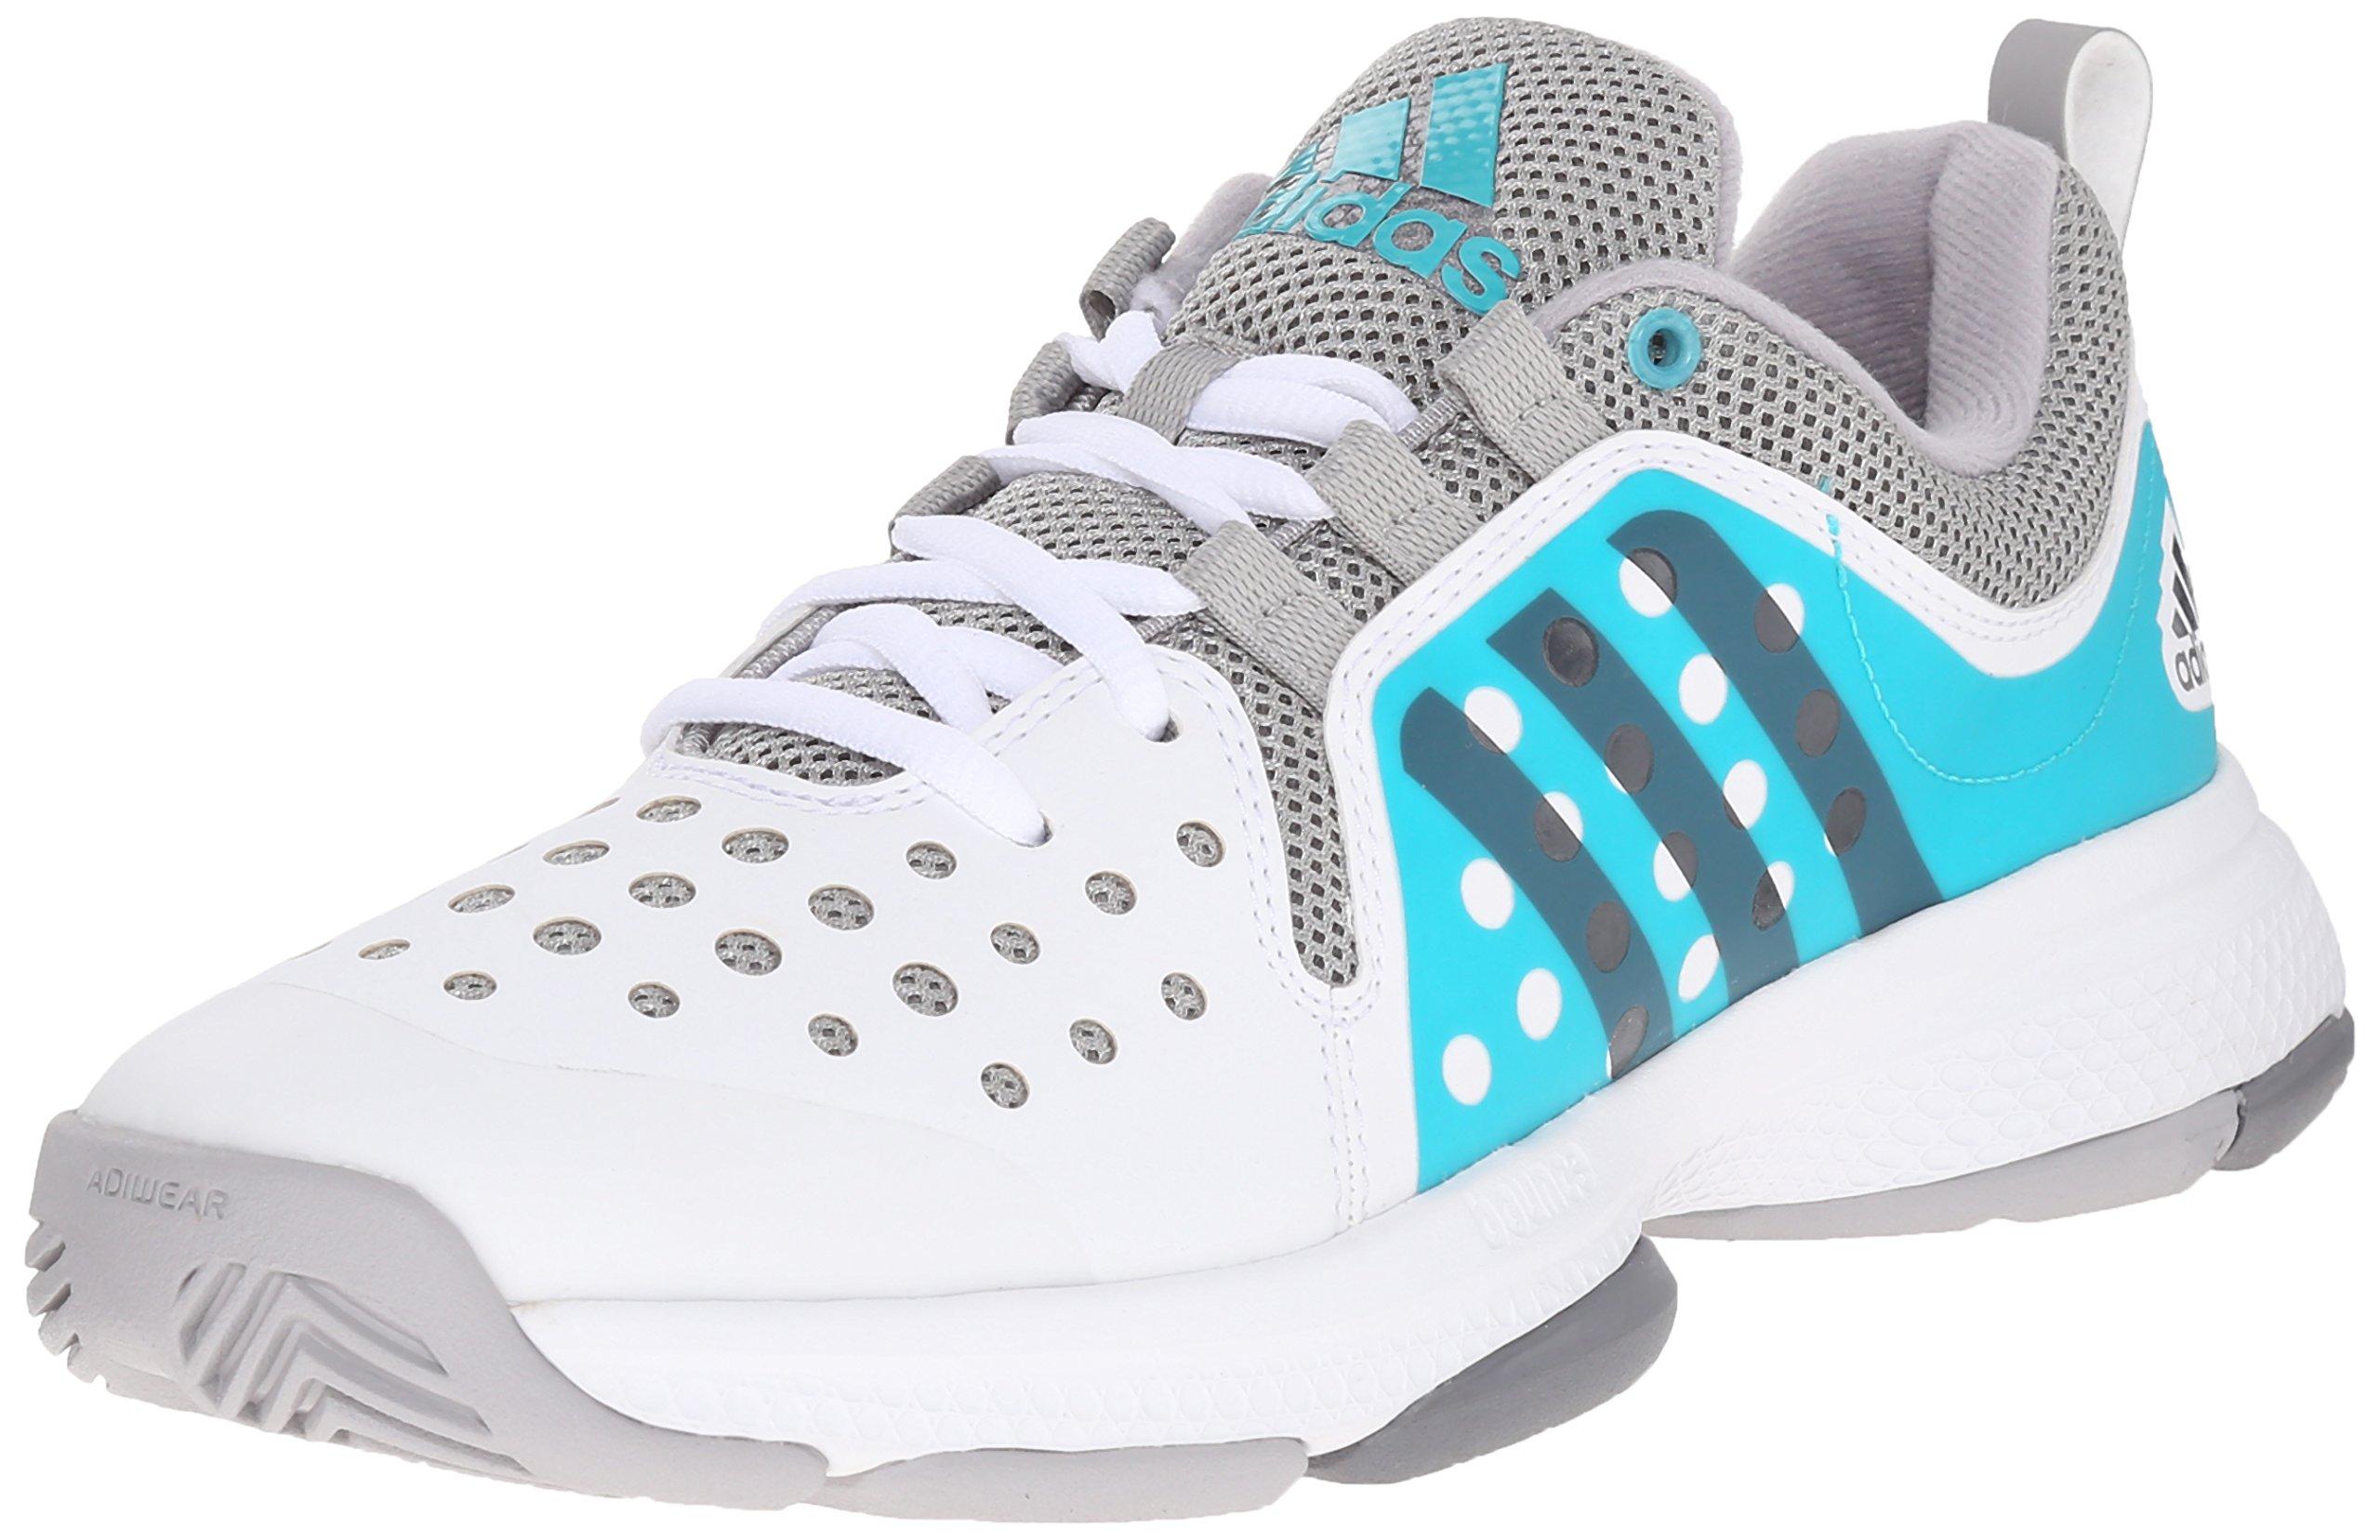 adidas Performance Women's Barricade Classic Bounce W Training Footwear,White/Night Grey Metallic/Shock Green,7 M US